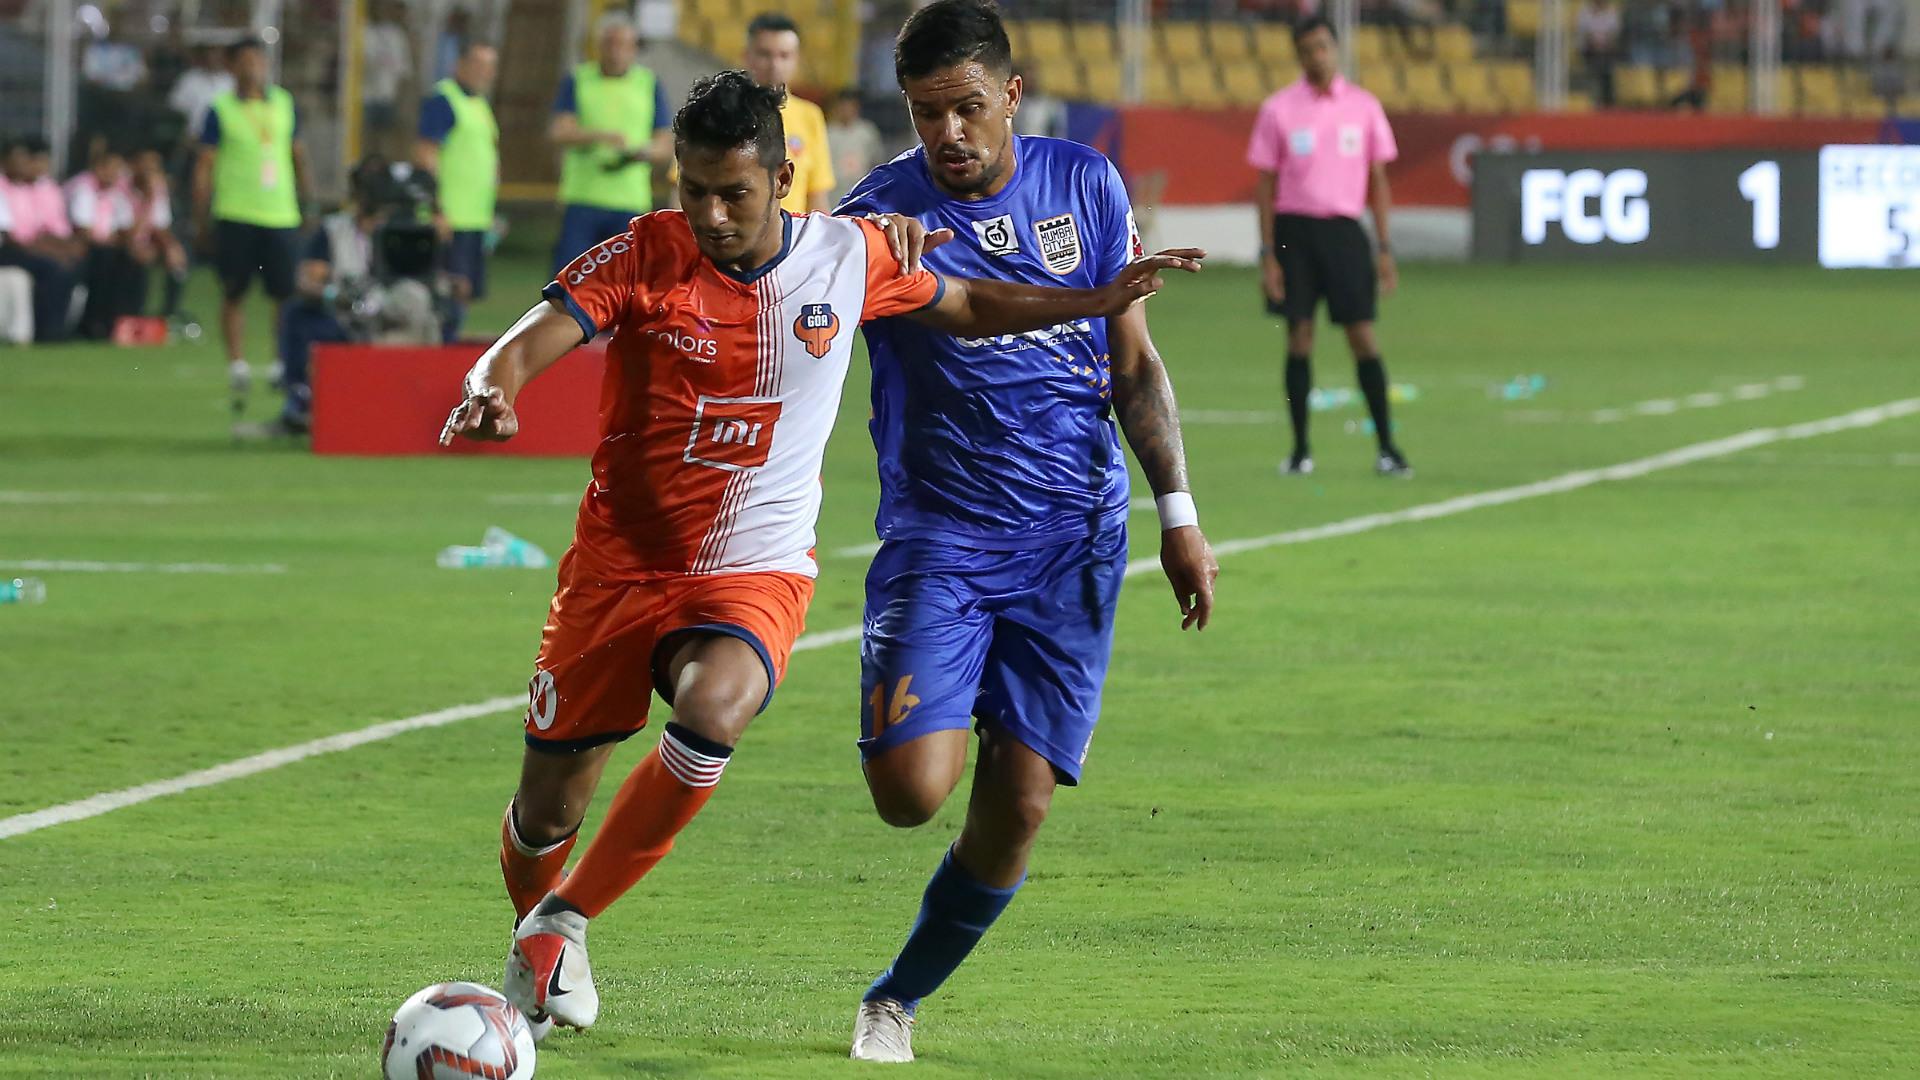 Seriton Fernandes FC Goa Mumbai City FC ISL 5 10242018